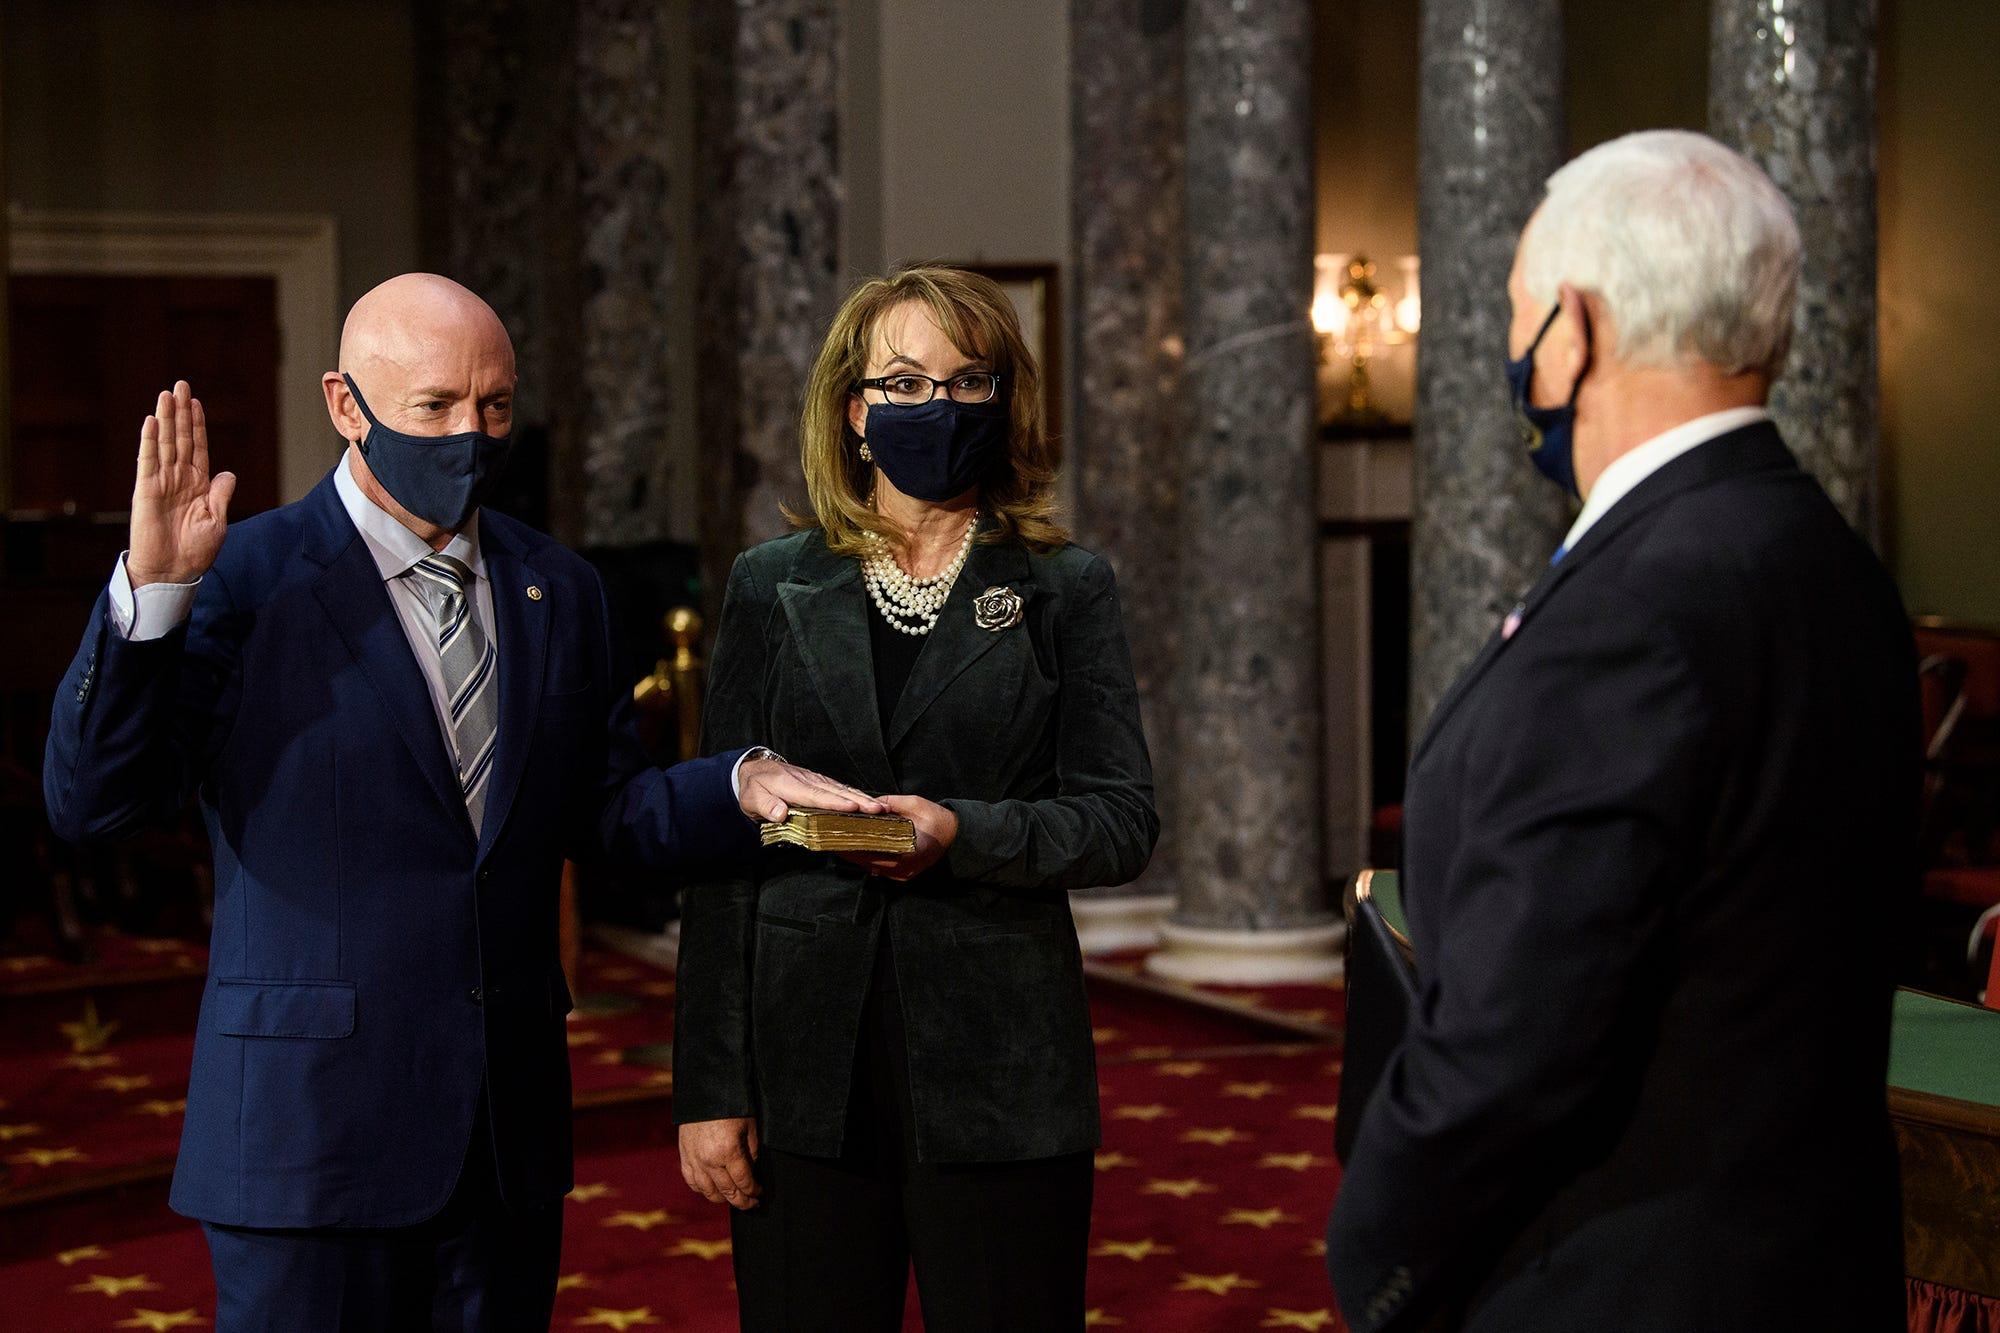 2 Dems in Senate: Kelly defeats McSally